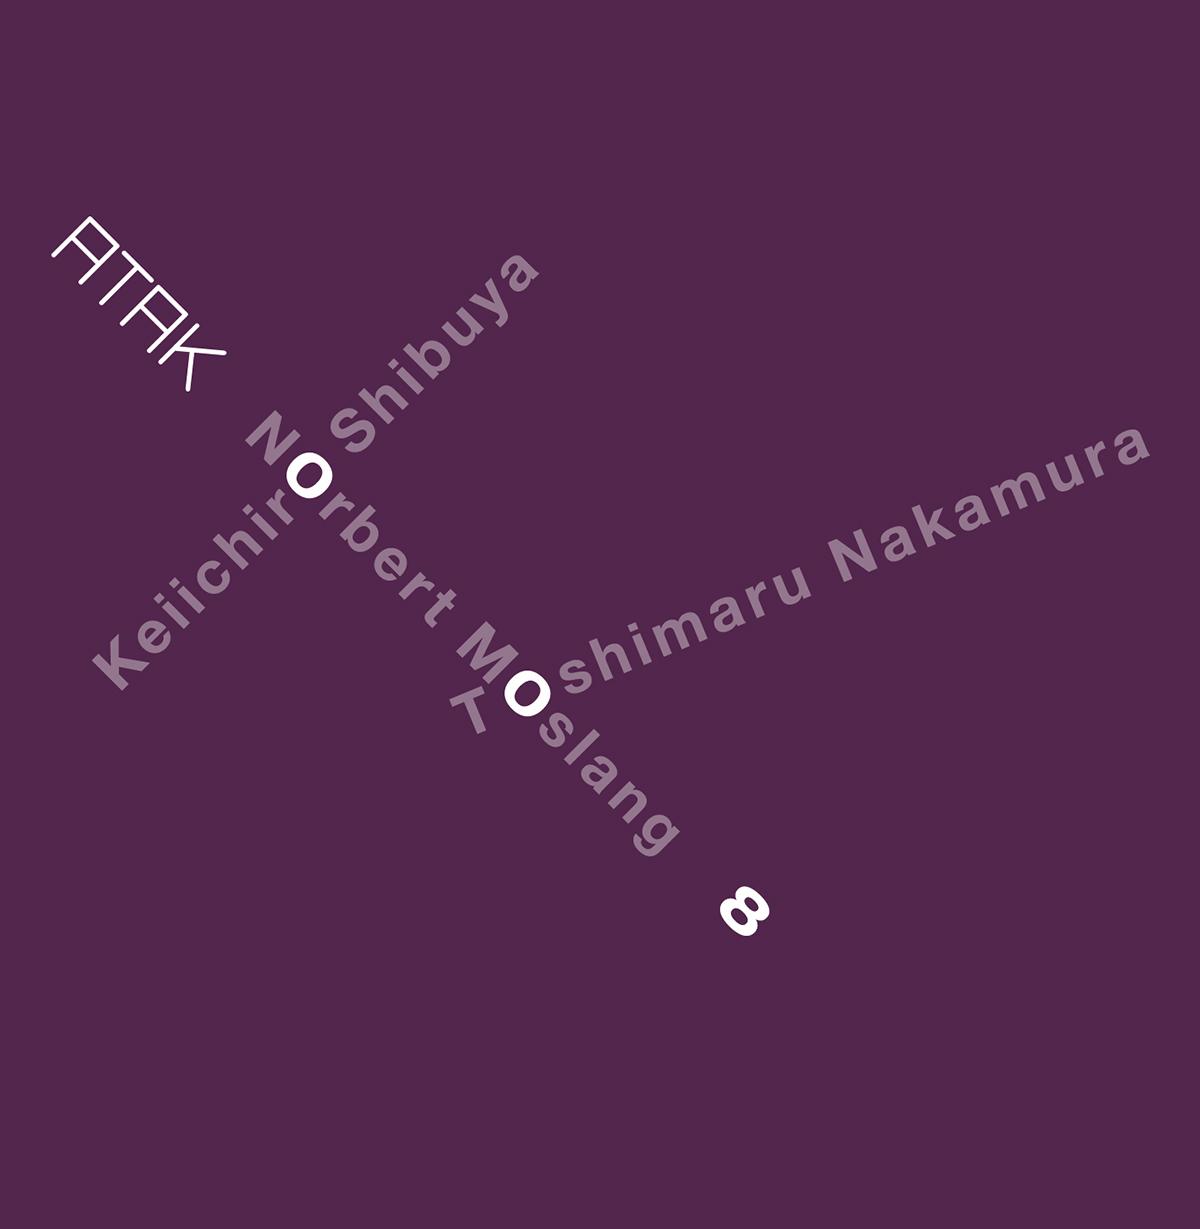 ATAK008 Keiichiro Shibuya+Norbert Moslang+Toshimaru Nakamura